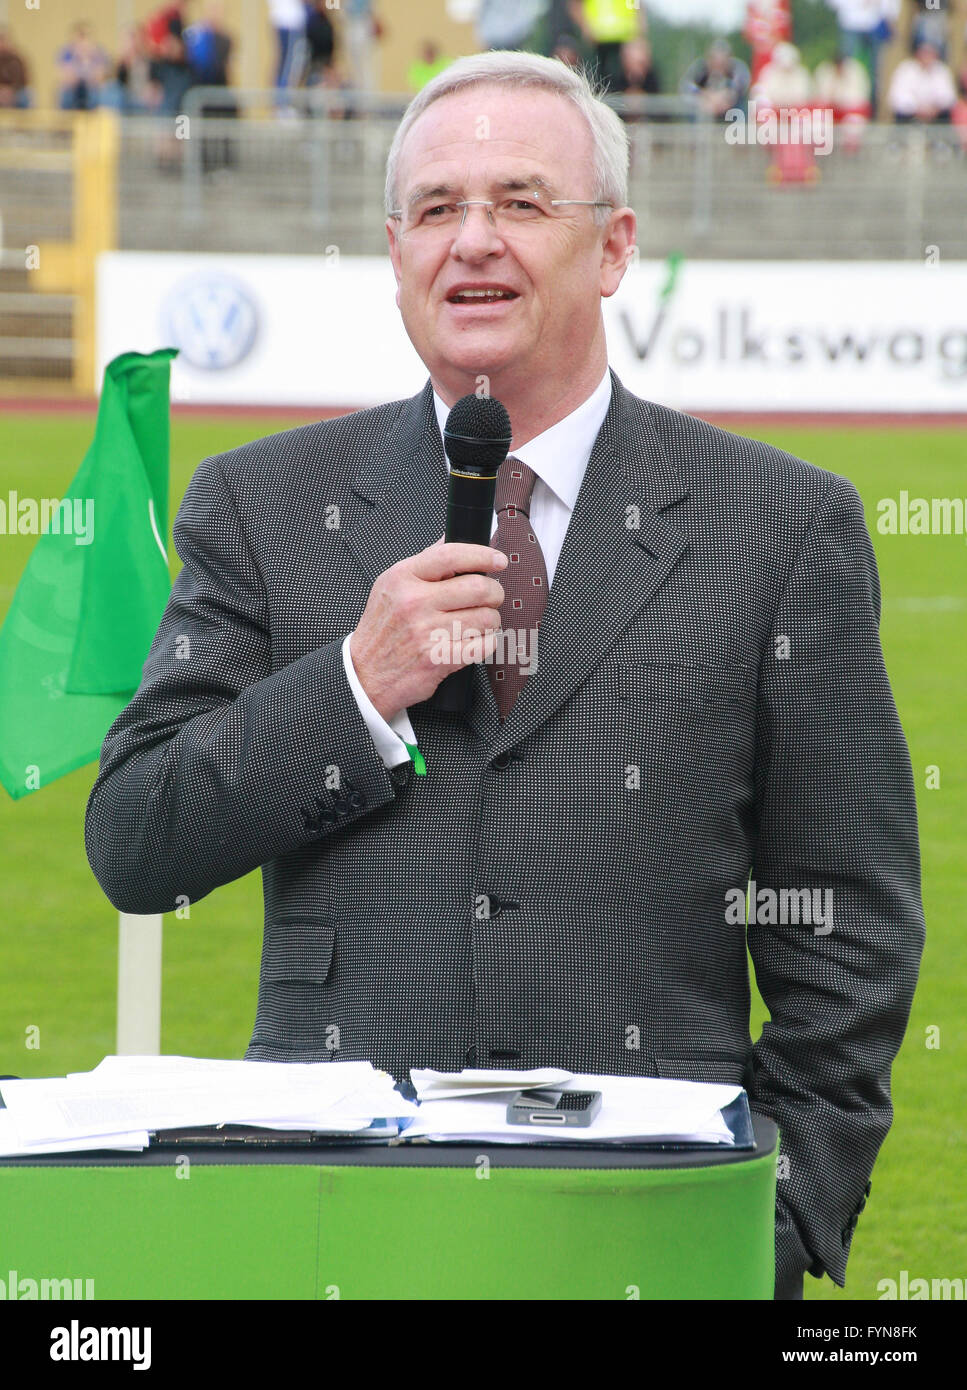 Martin Winterkorn, VW Wolfsburg - Stock Image